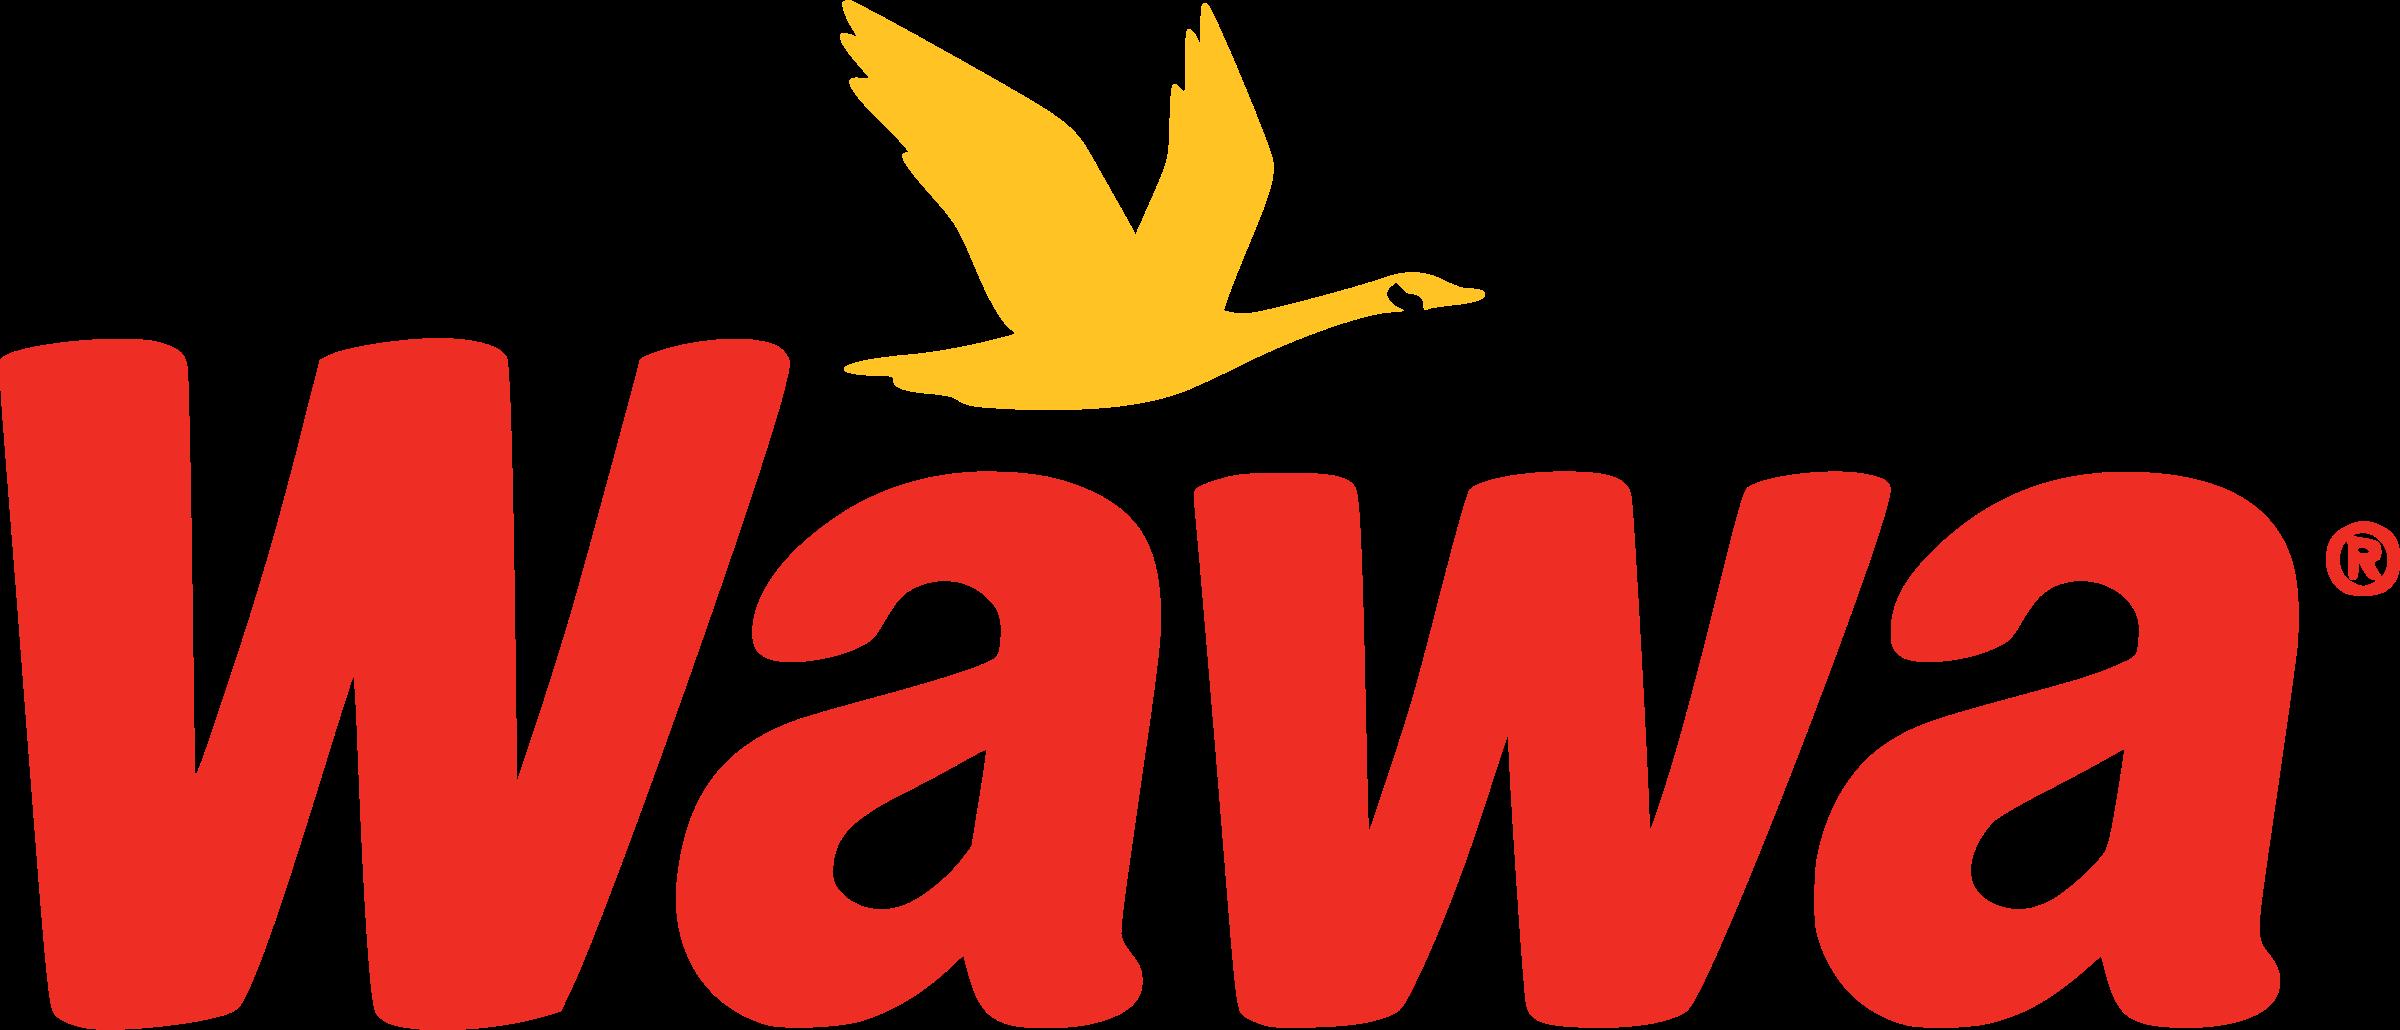 wawa-logo-png-transparent-svg-vector-freebie-supply-wawa-logo-png-2400_1030